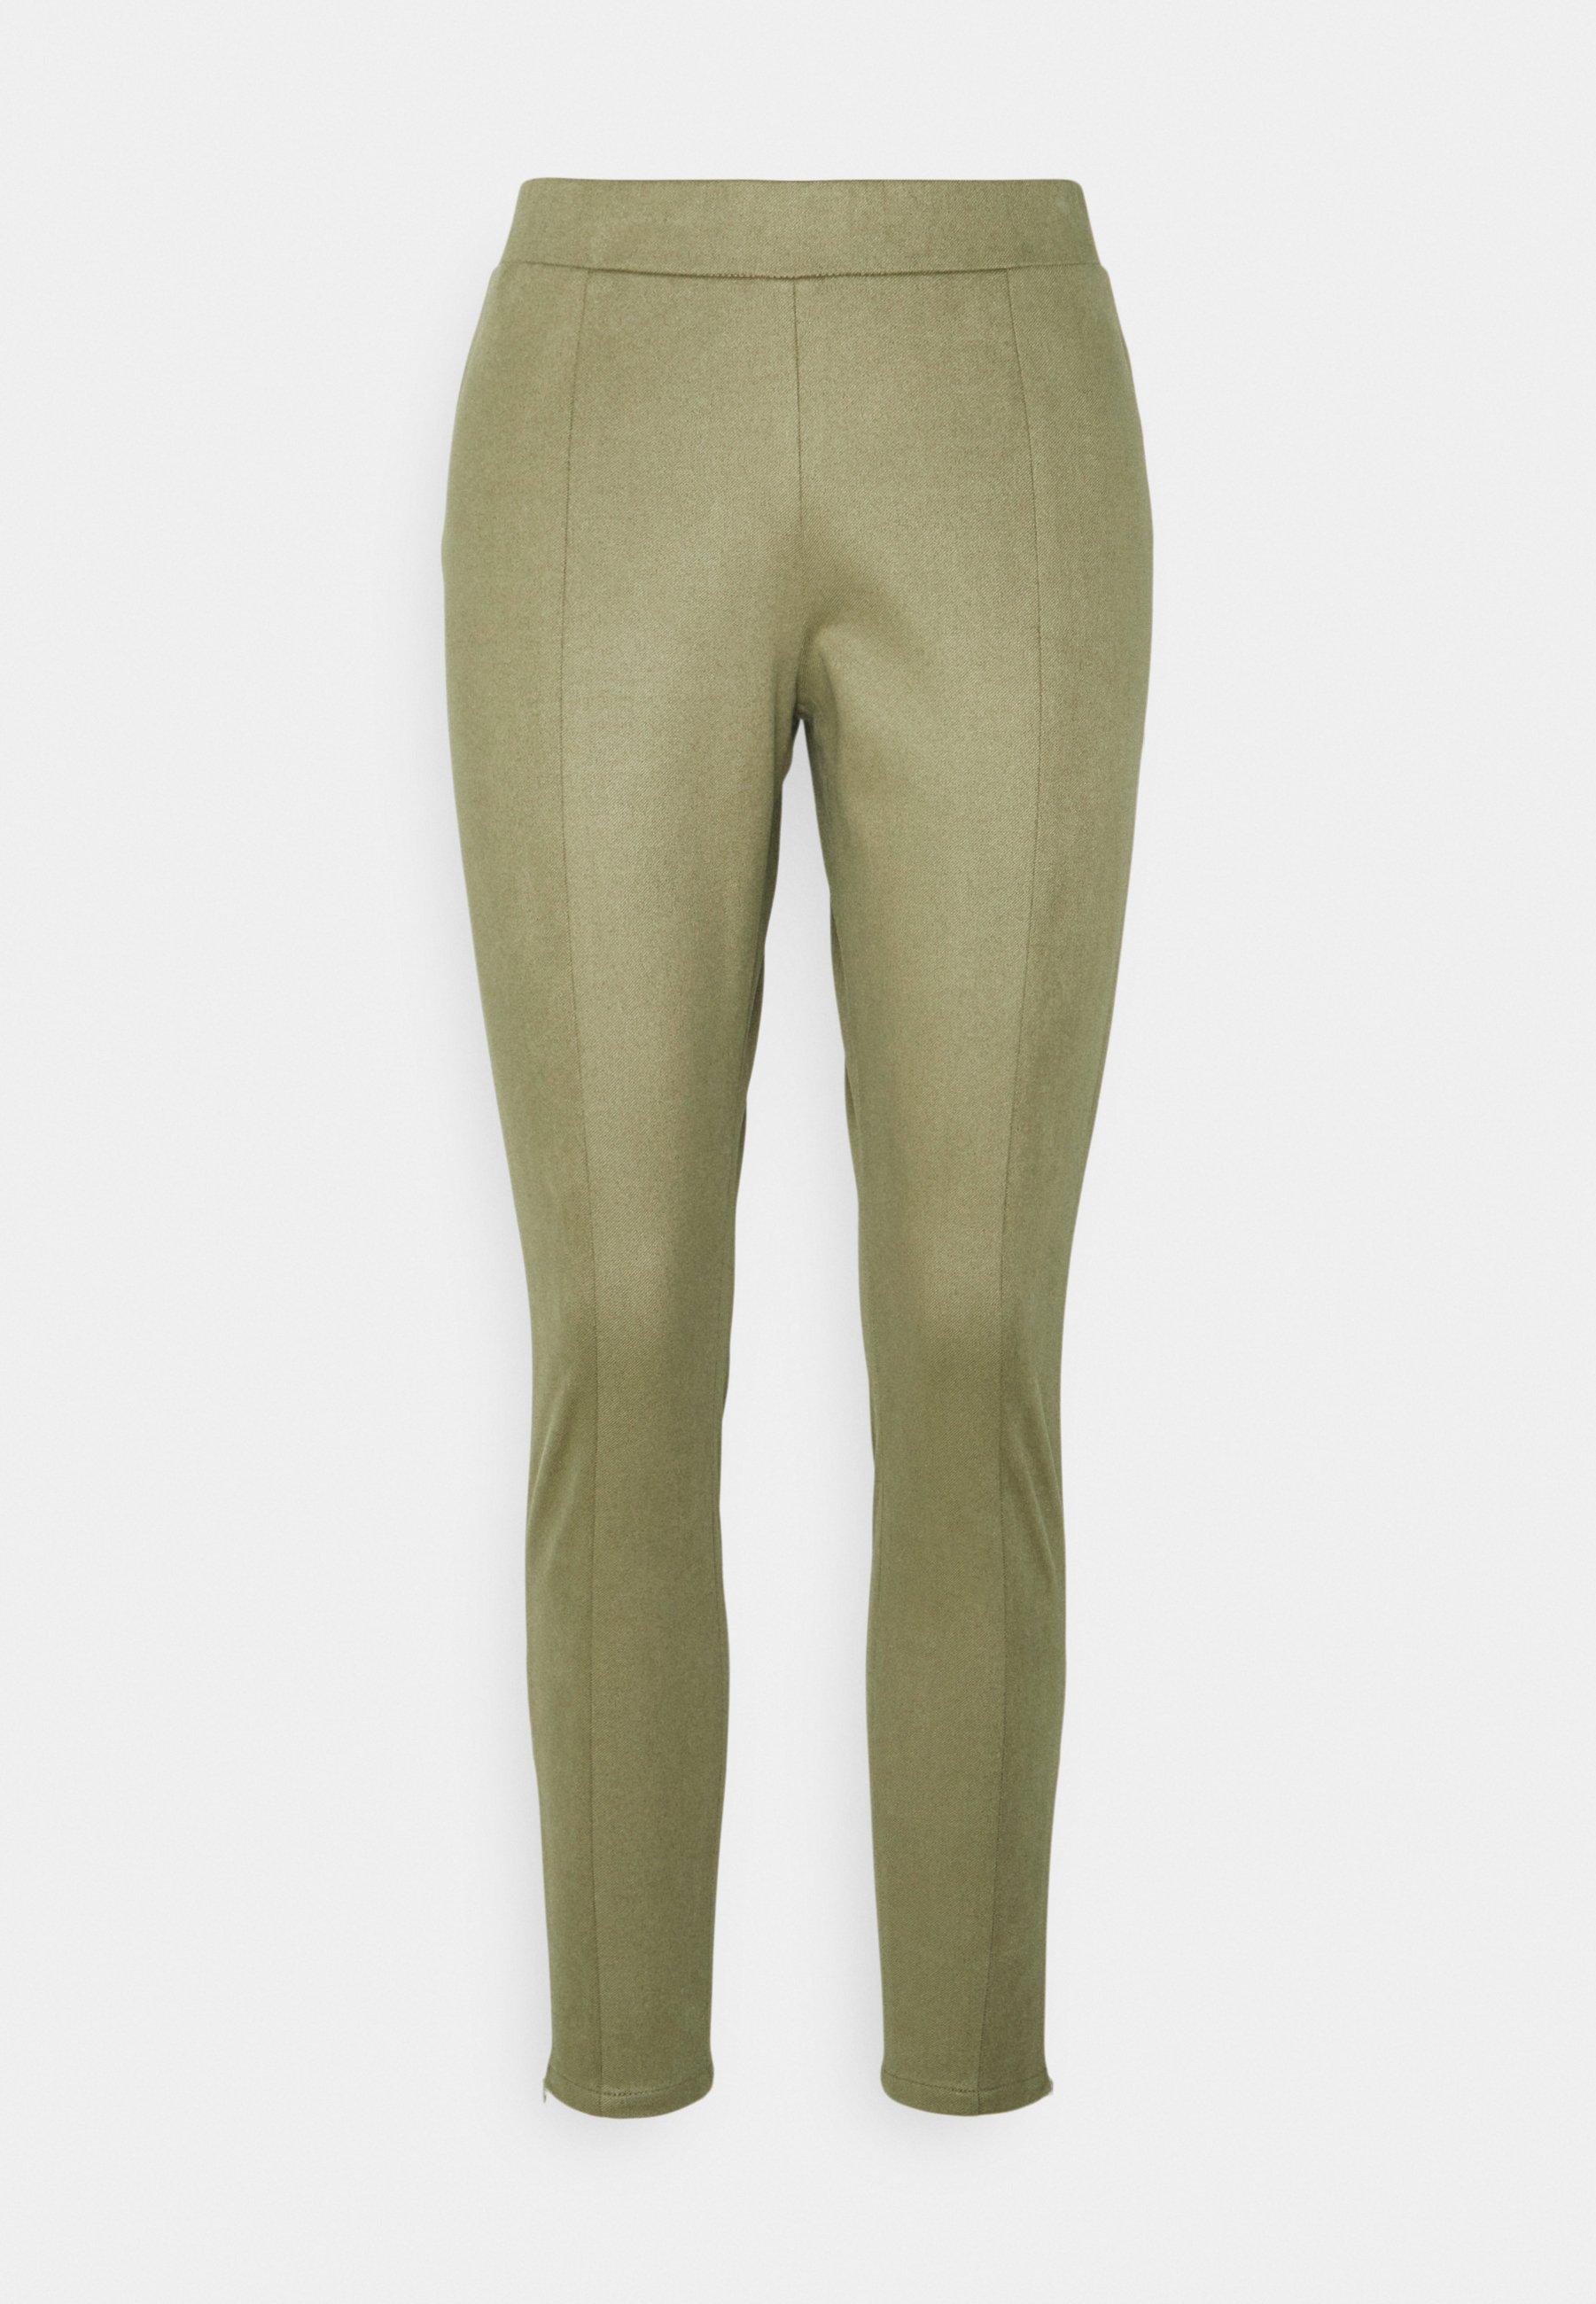 Women NMNORA - Leggings - Trousers